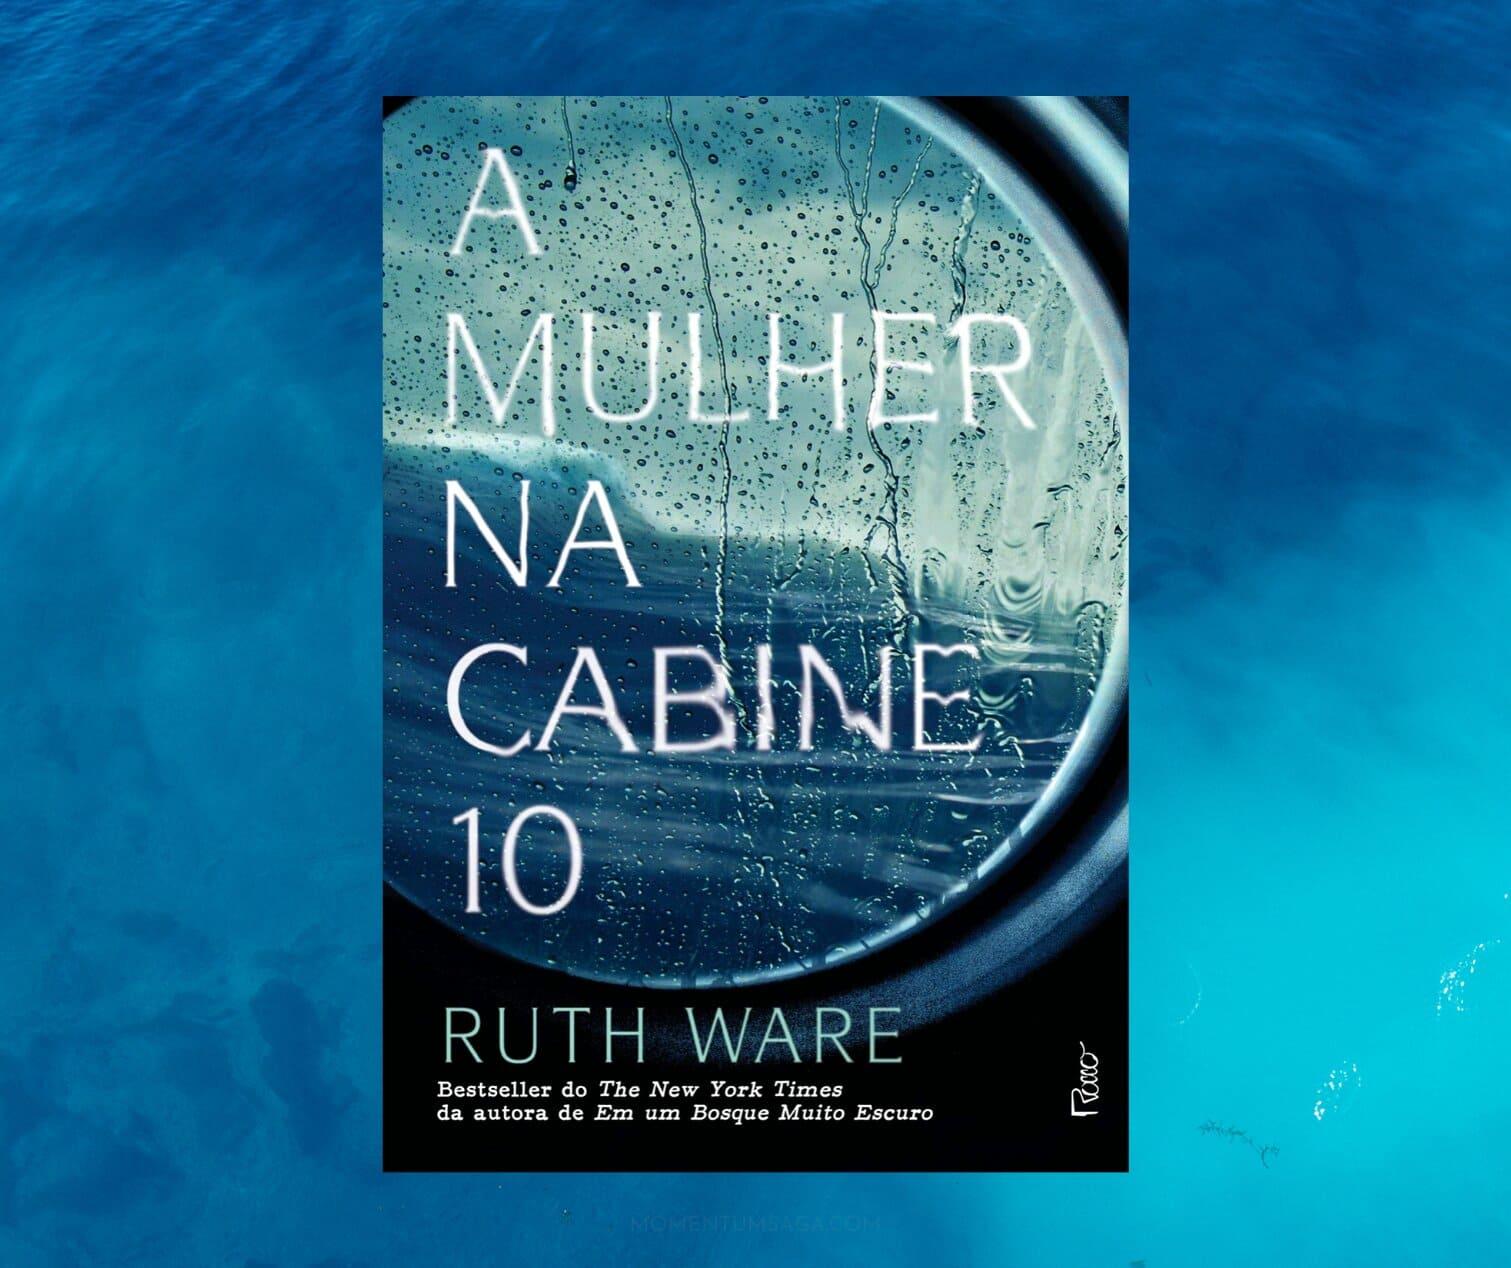 Resenha: A mulher na cabine 10, de  Ruth Ware